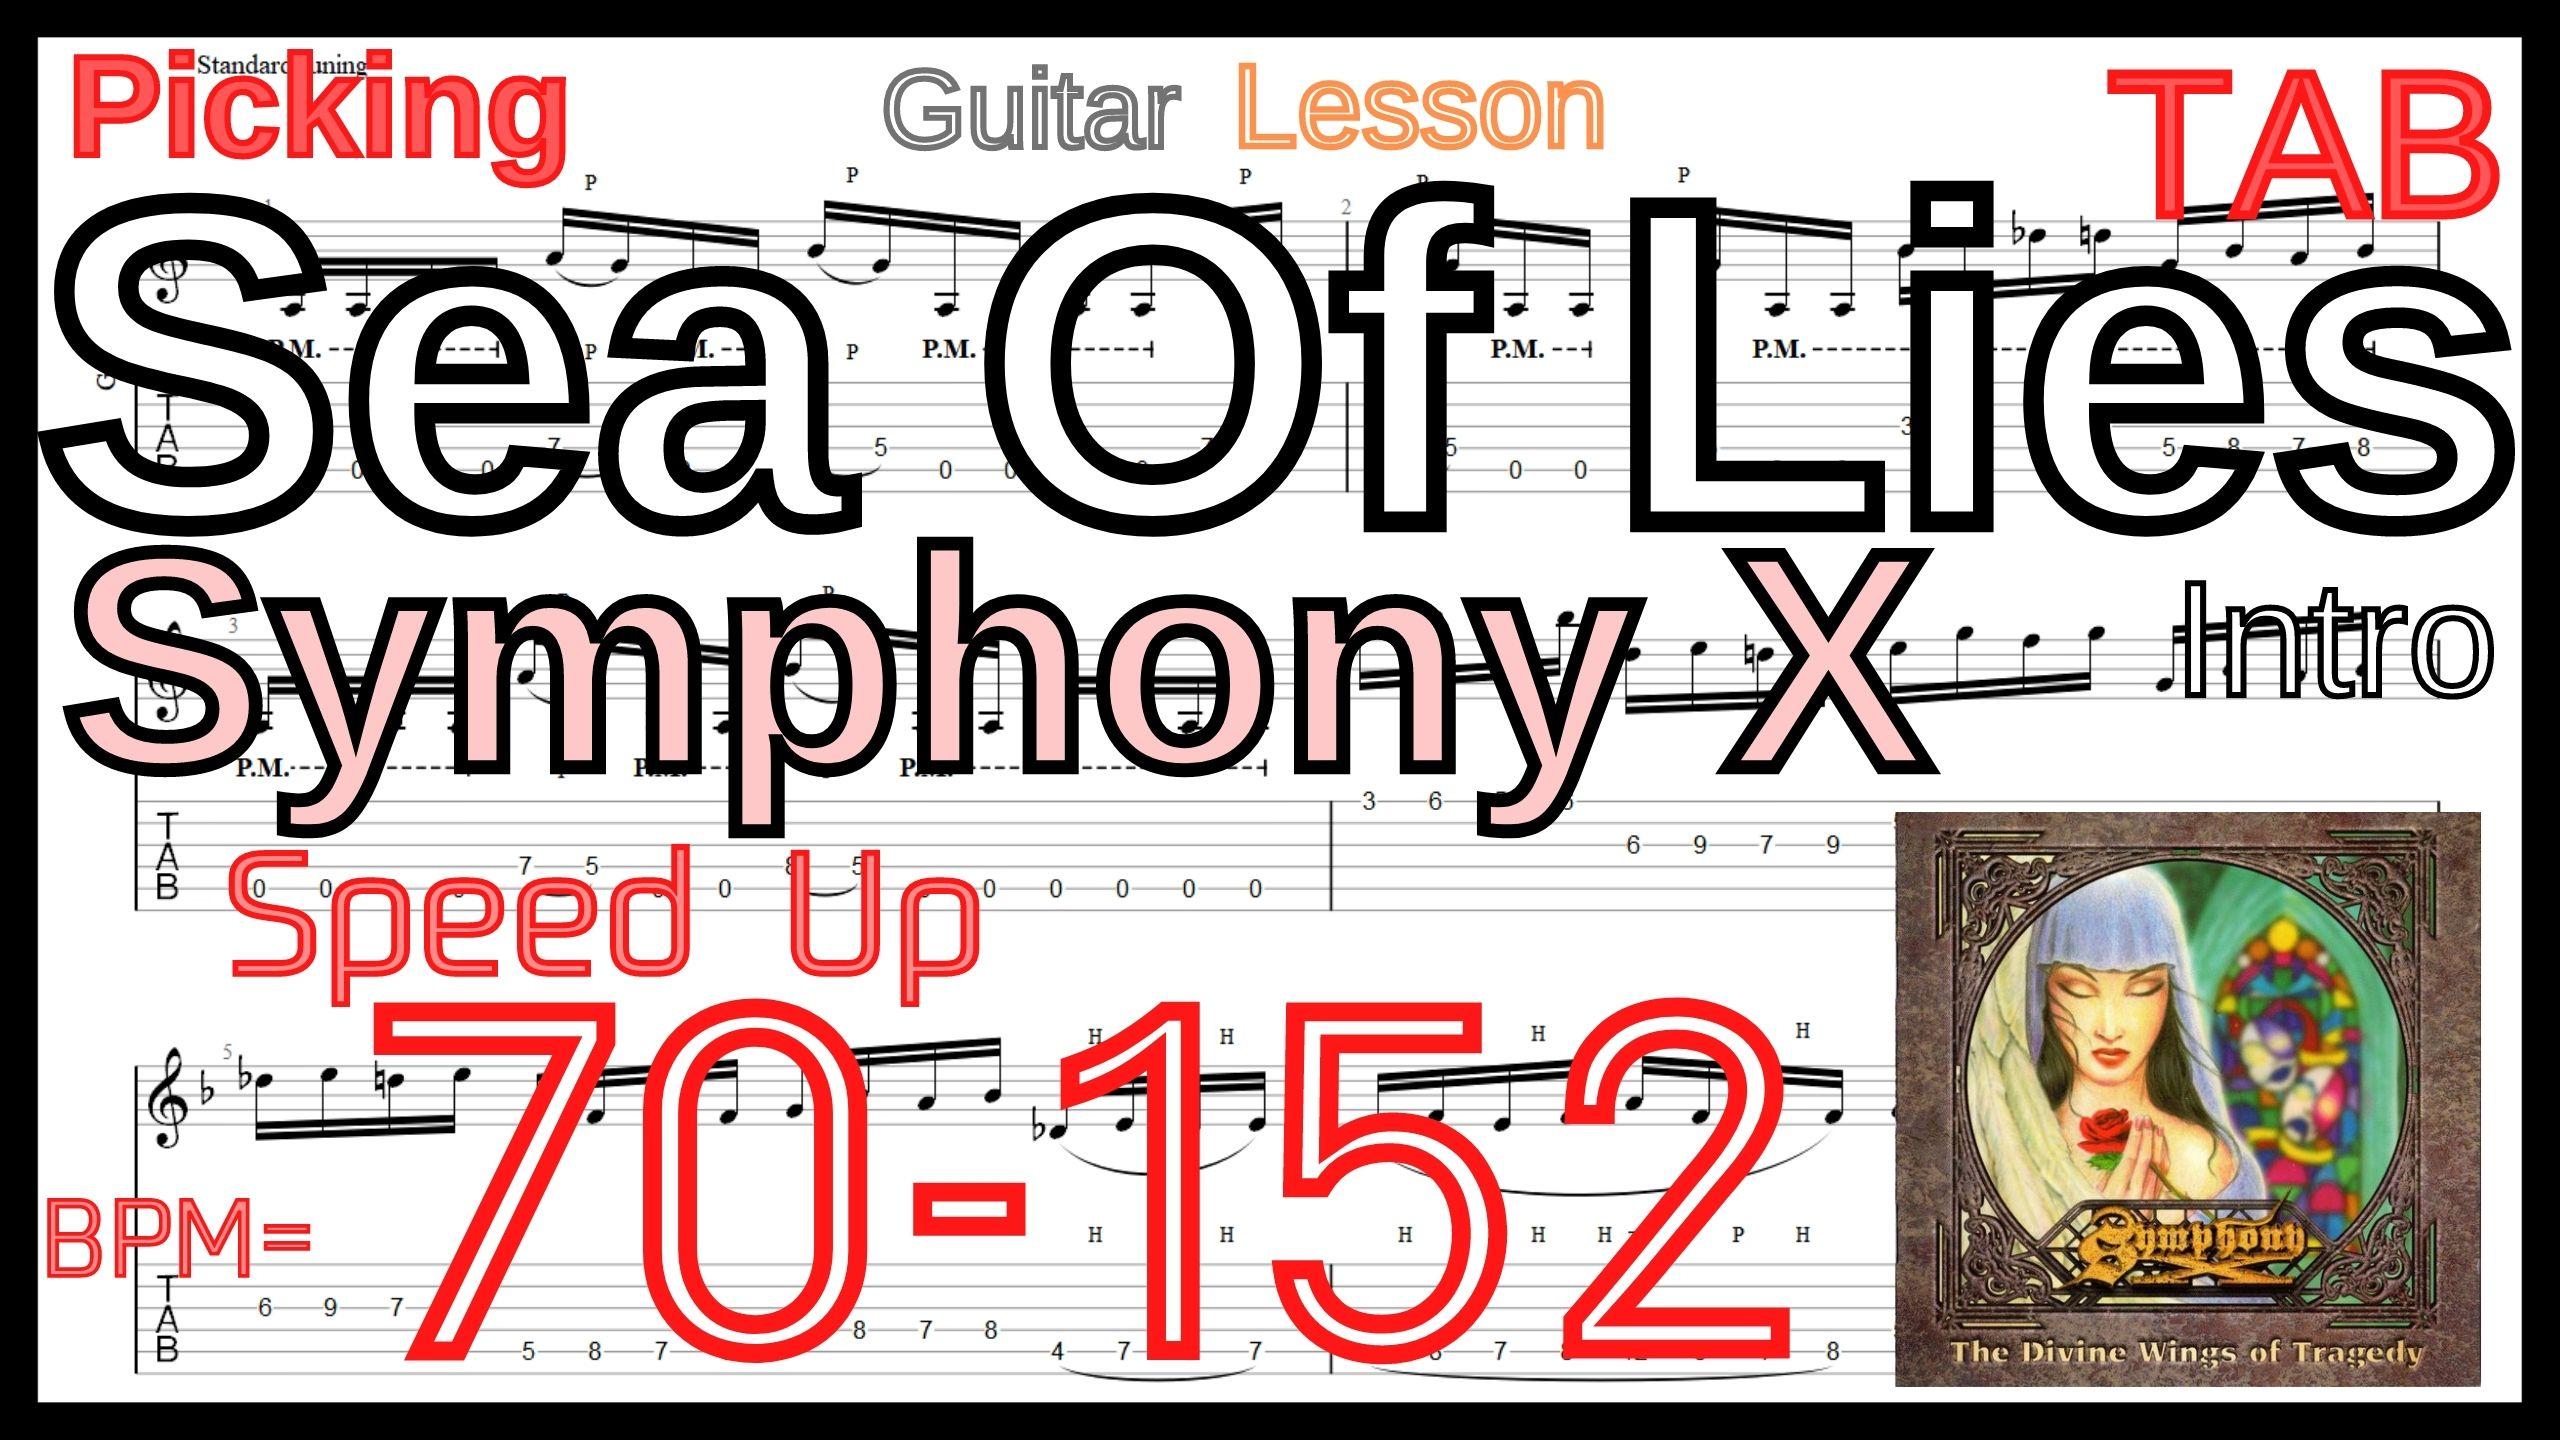 【TAB】Sea Of Lies / Symphony X  Intro Guitar Michael Romeo シンフォニーX マイケルロメオ ギター基礎練習 BPM70-152【Picking・Tapping】